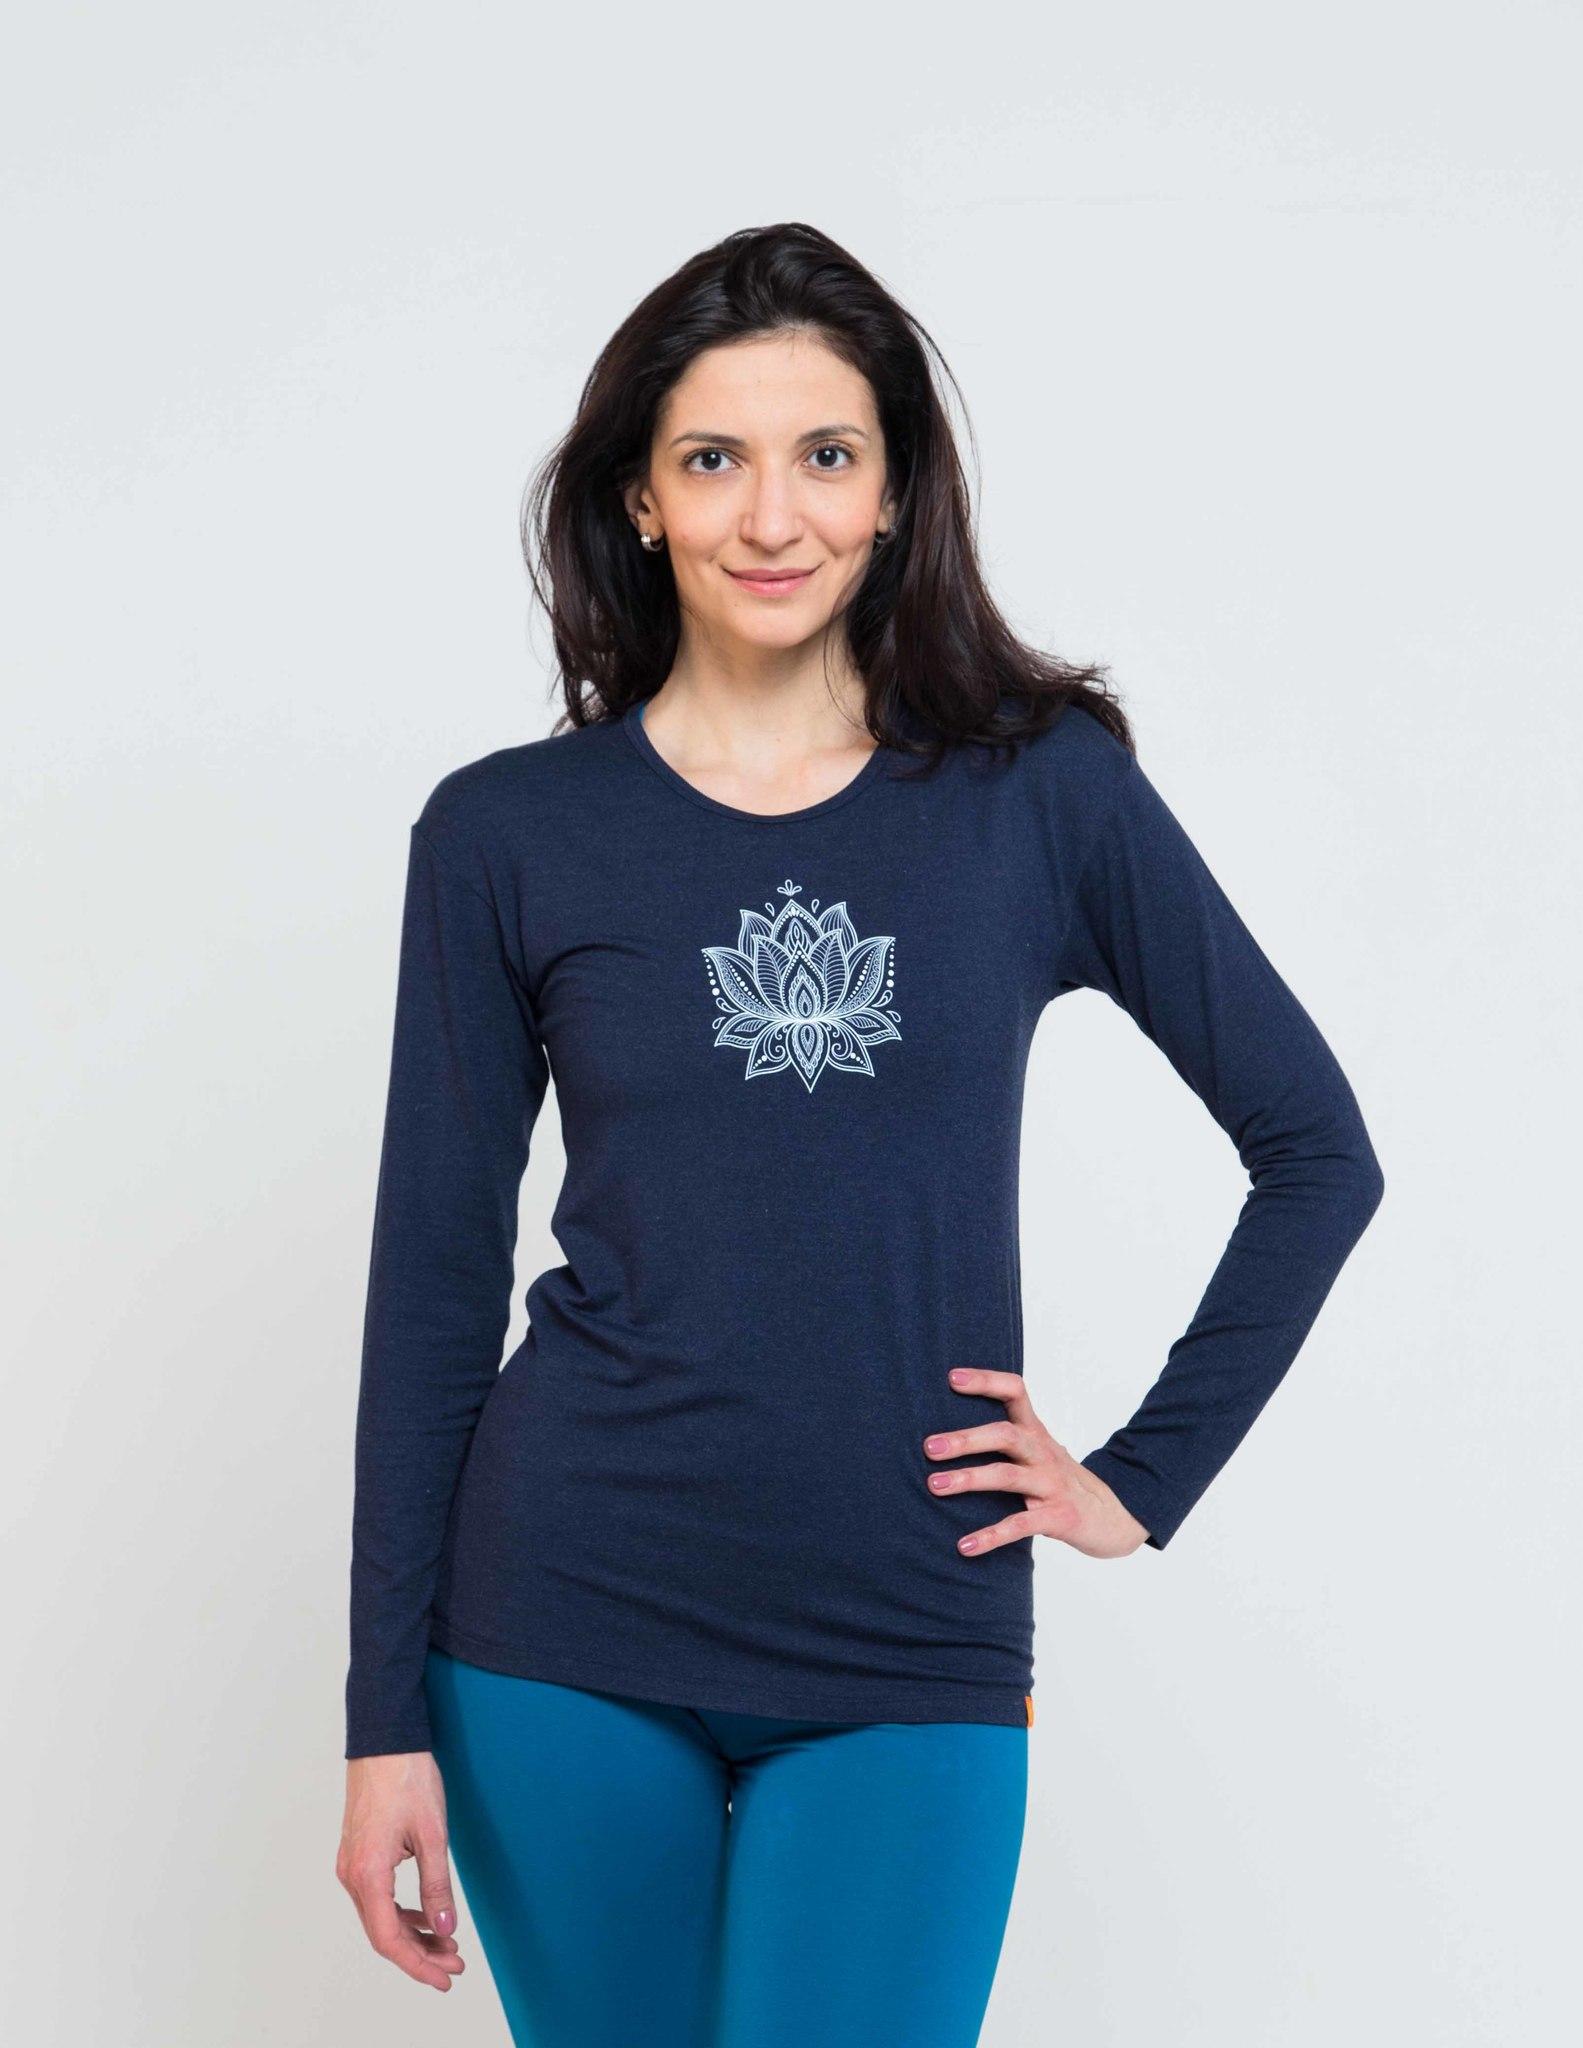 Футболка женская Лотос с длинным рукавом YogaDress (0.2 кг, M (46), синий) ошейники и поводки для собак foam cotton pet collars 3 xs s m l xl xs s m l xl